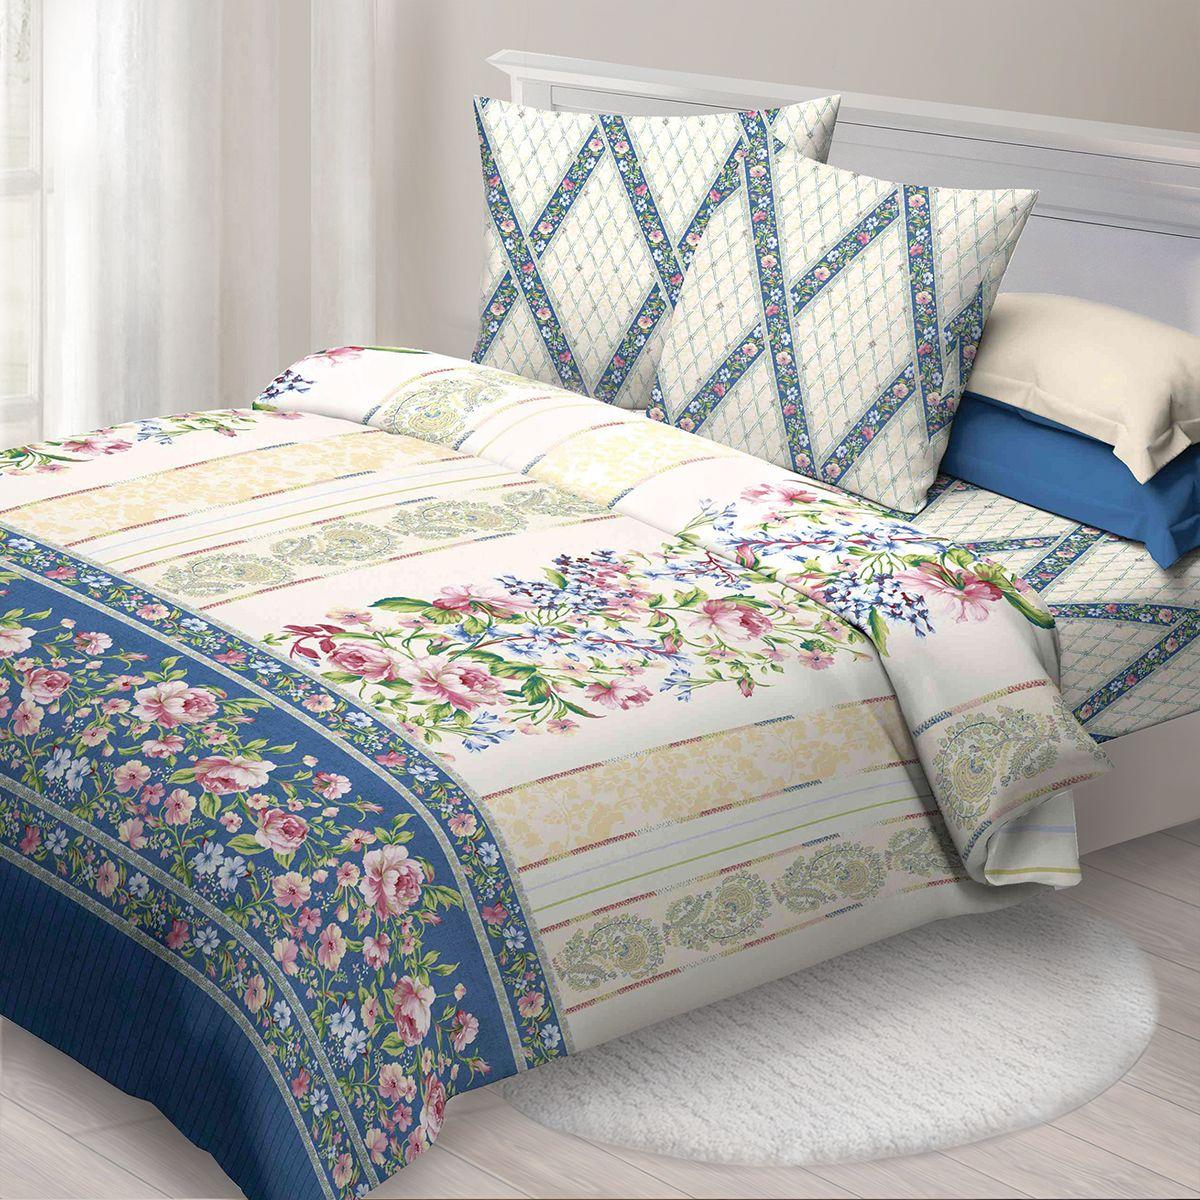 Комплект белья Спал Спалыч Соблазн, 1,5 спальное, наволочки 70x70, цвет: синий. 3523-182443